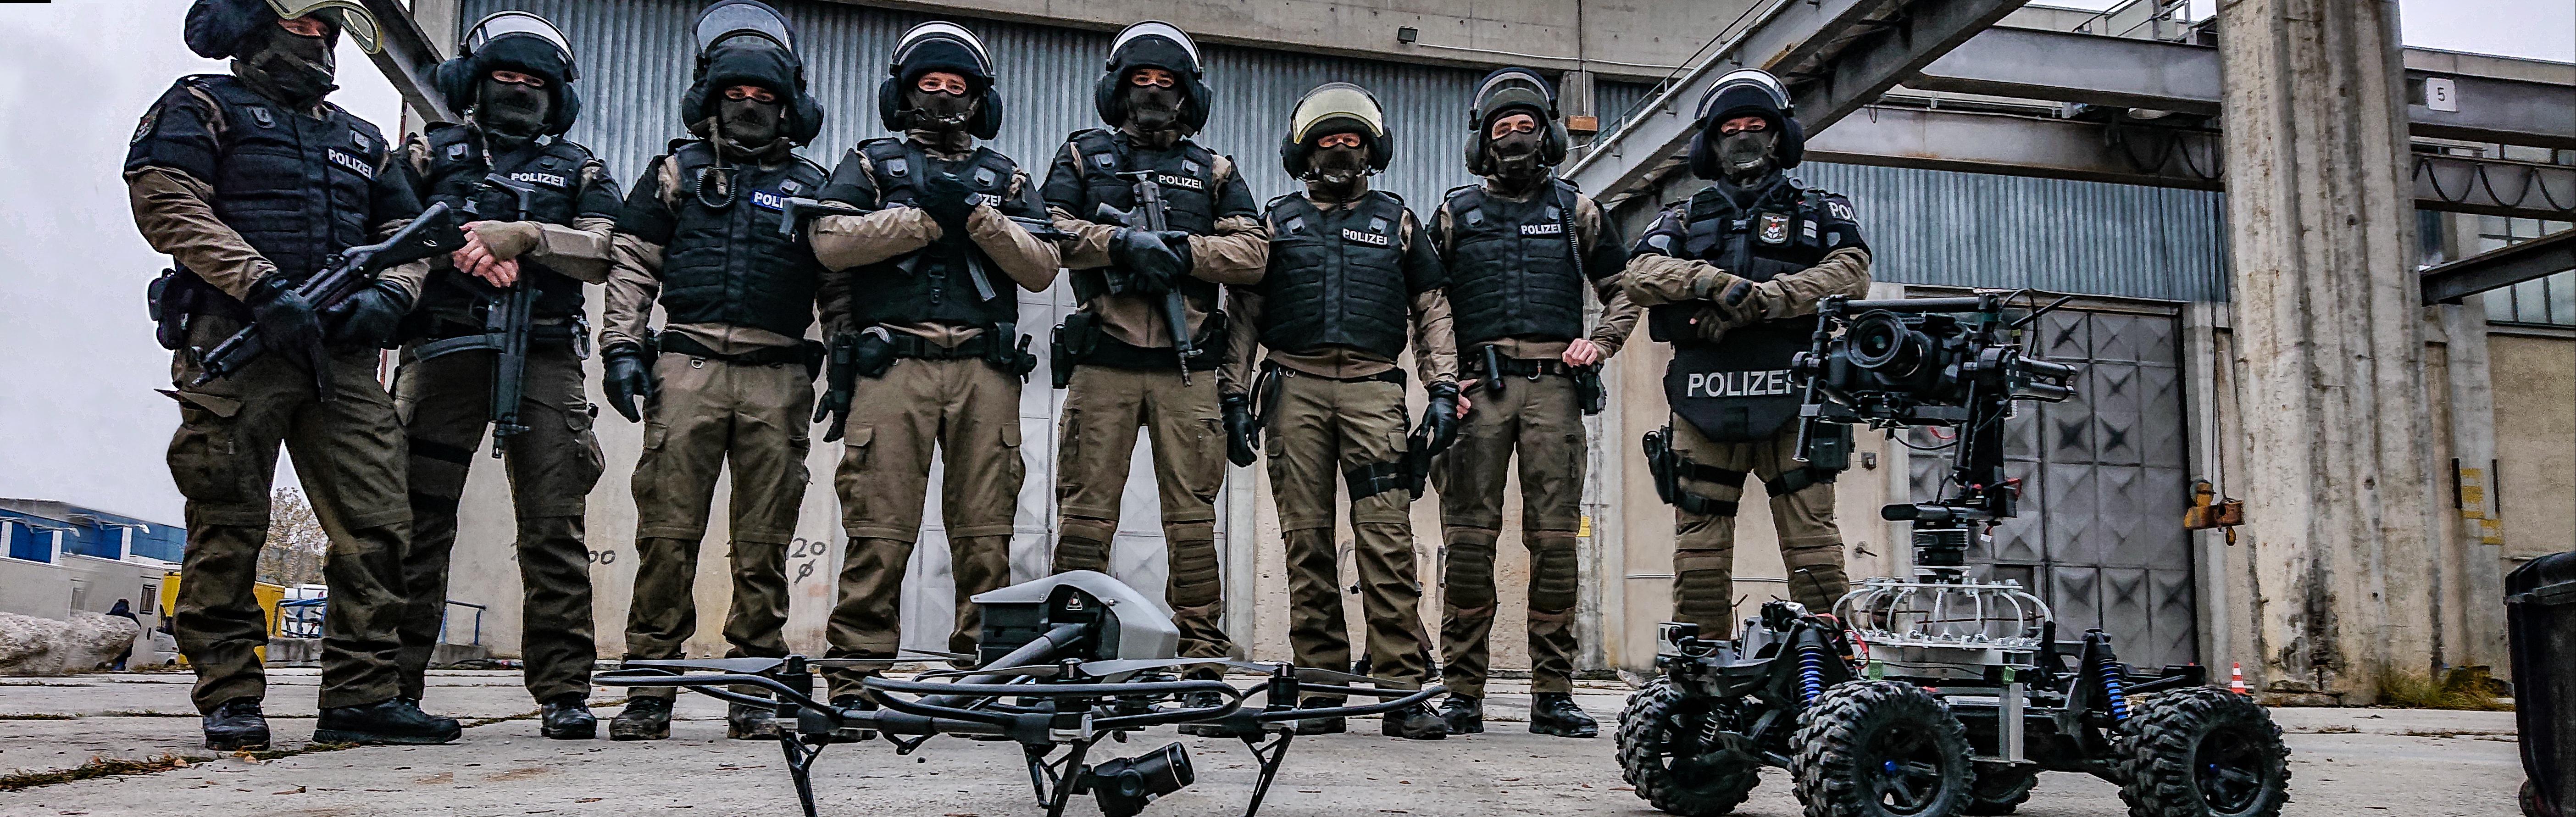 Drone team lukas maurer fabian christ dji inspire matrice 600 alexa mini X5R